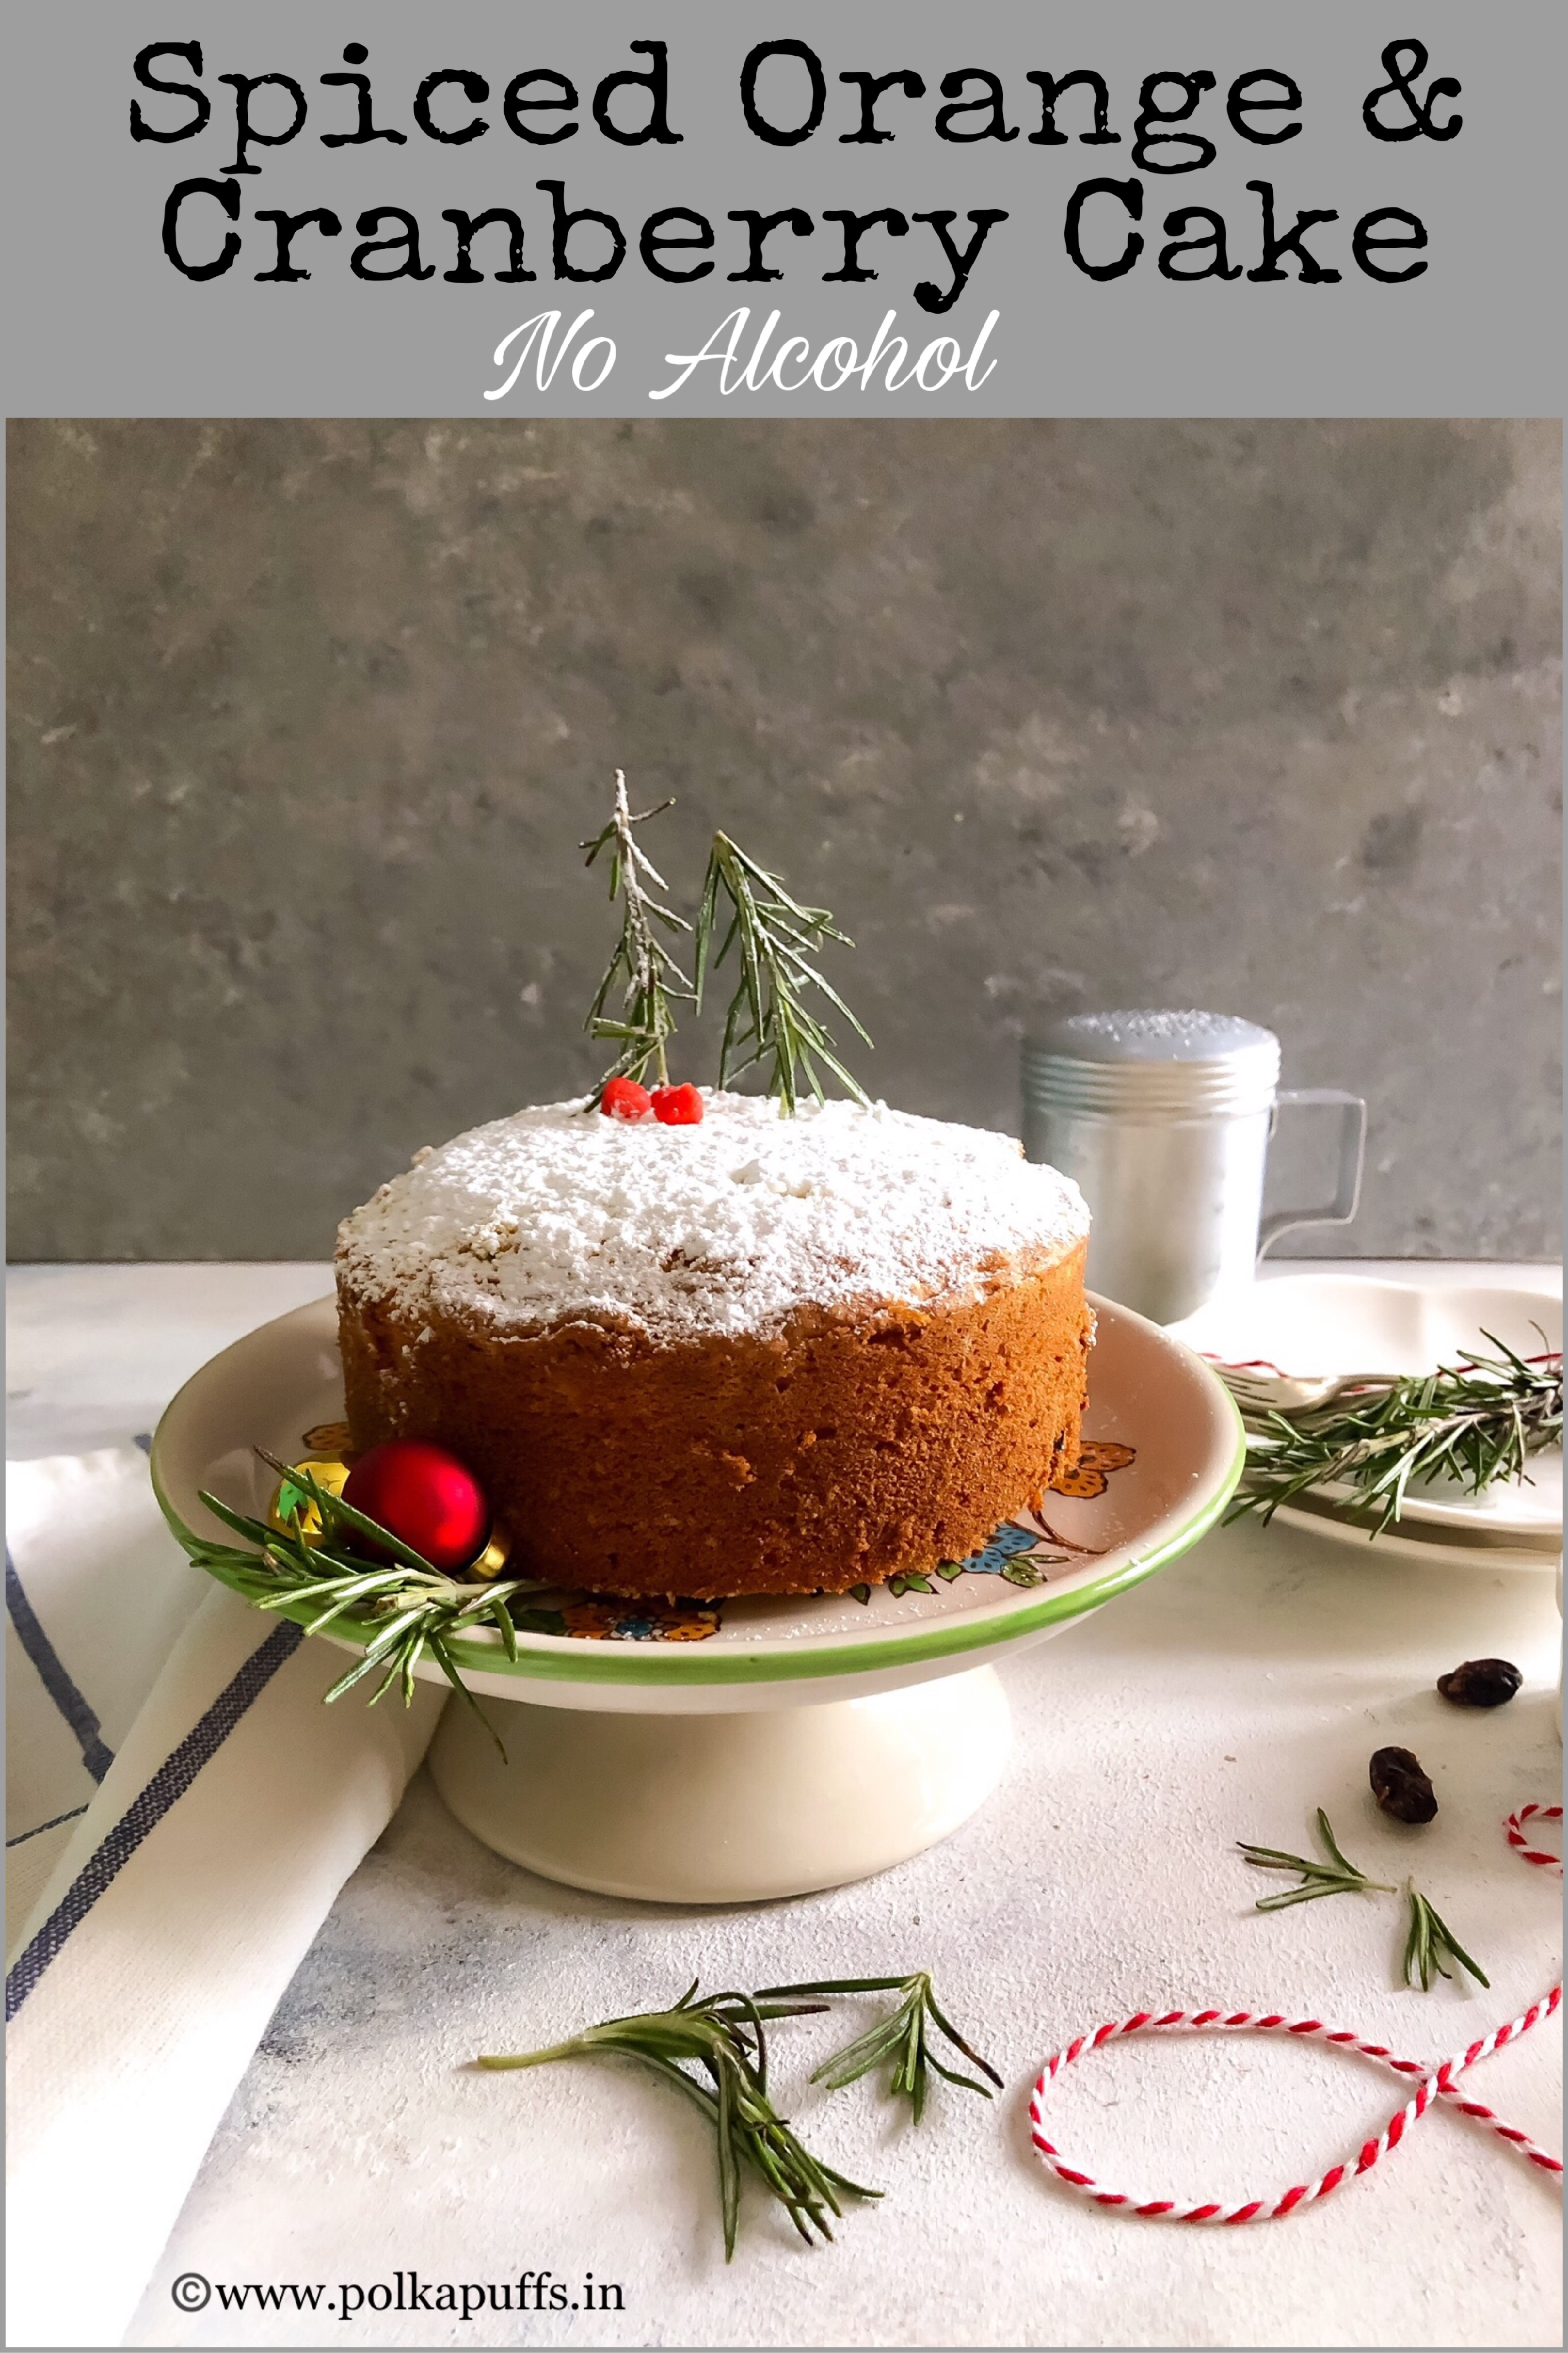 spiced orange cranberry cake pnterest